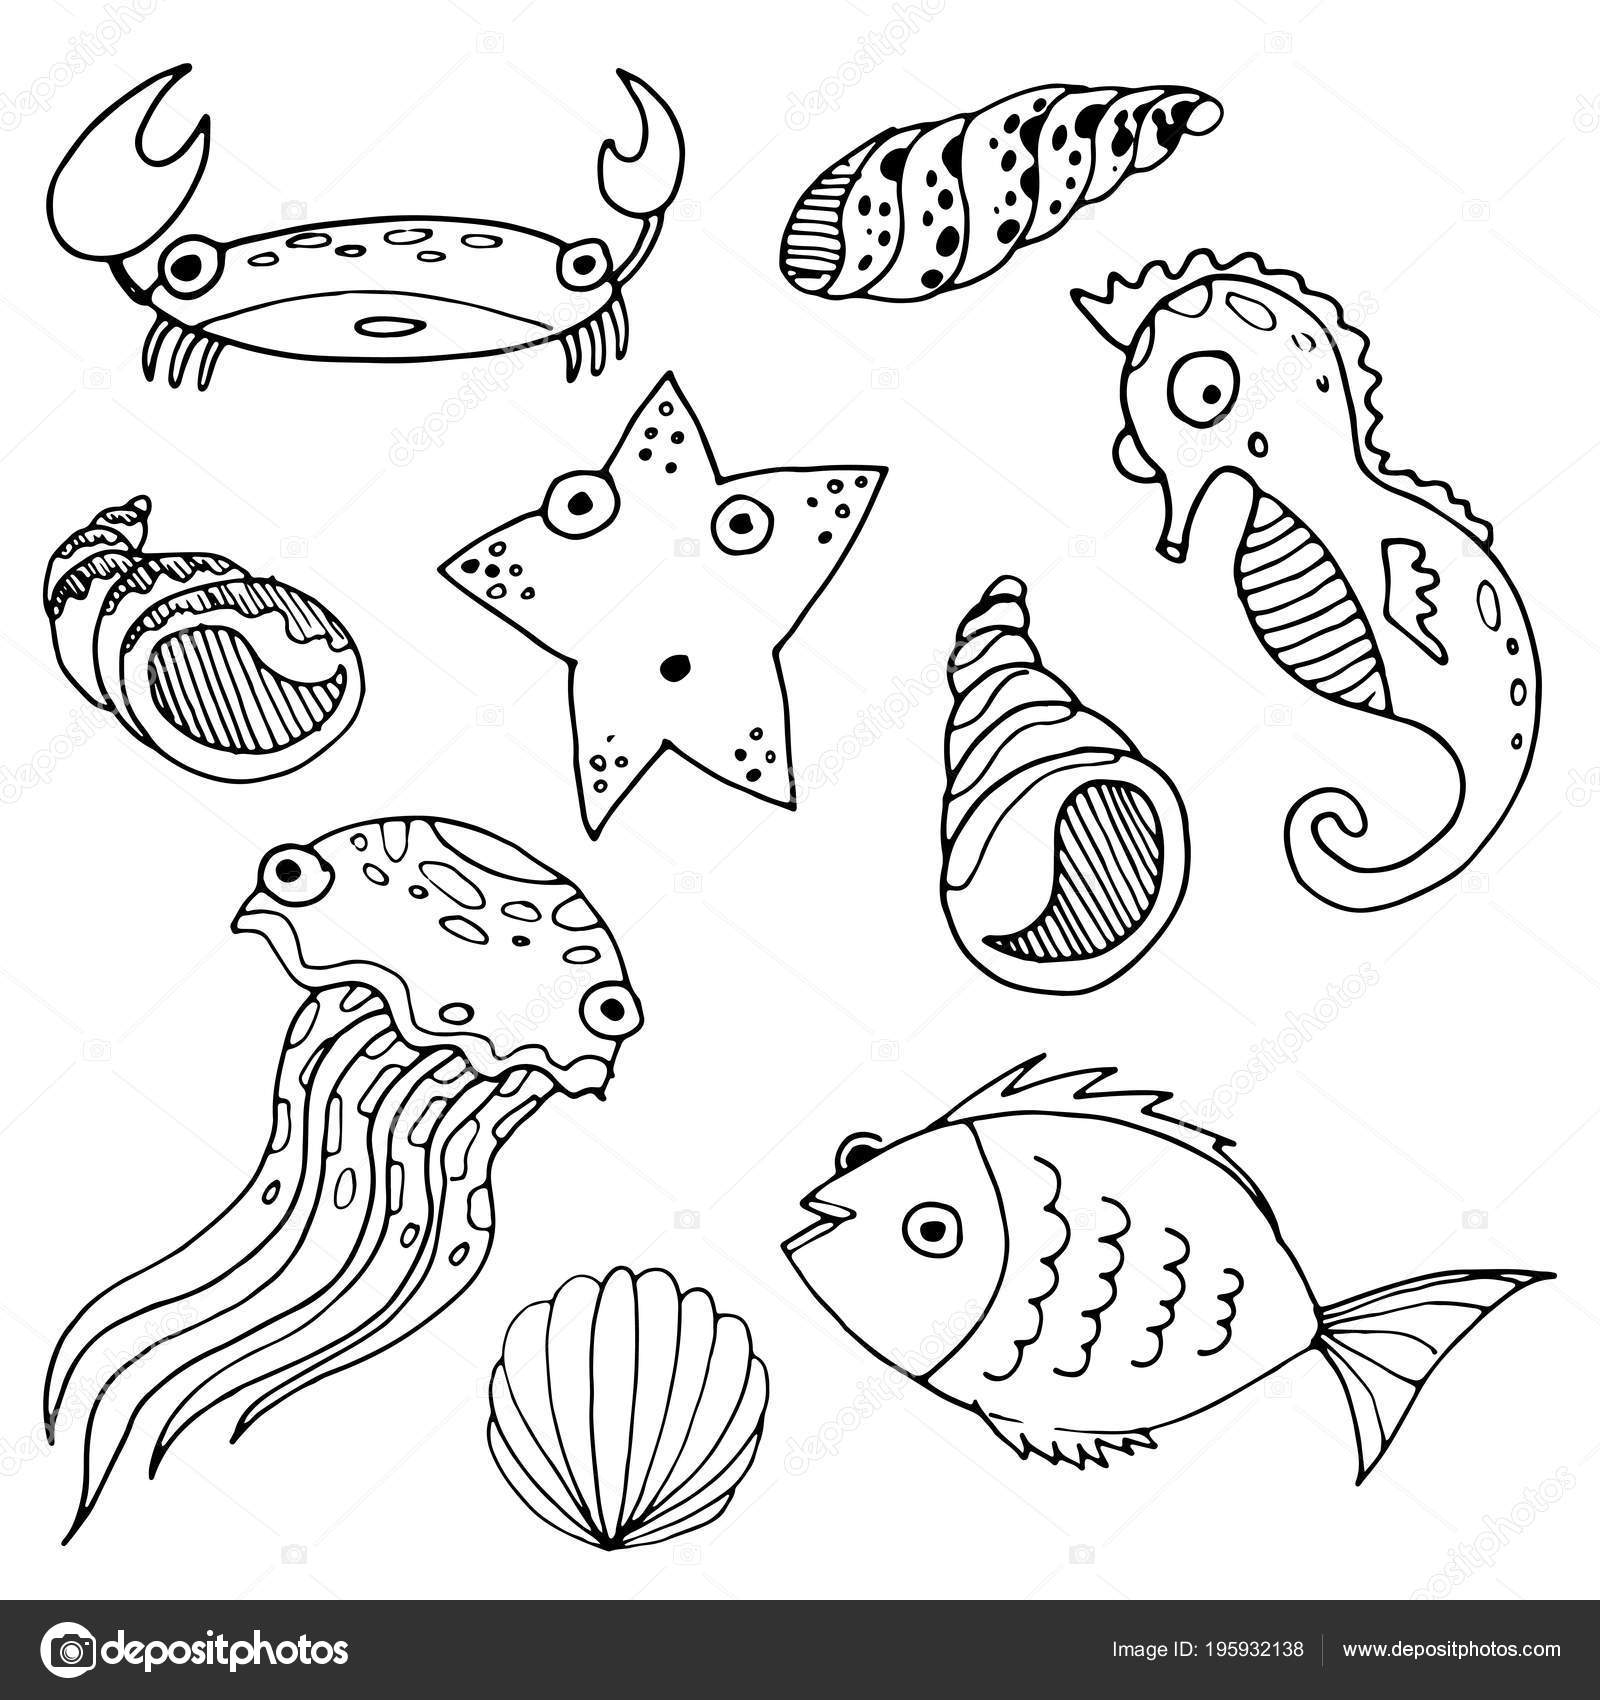 Vectores Animales Mar Dibujos Animados Dibujo Mano Dibujada Para ...